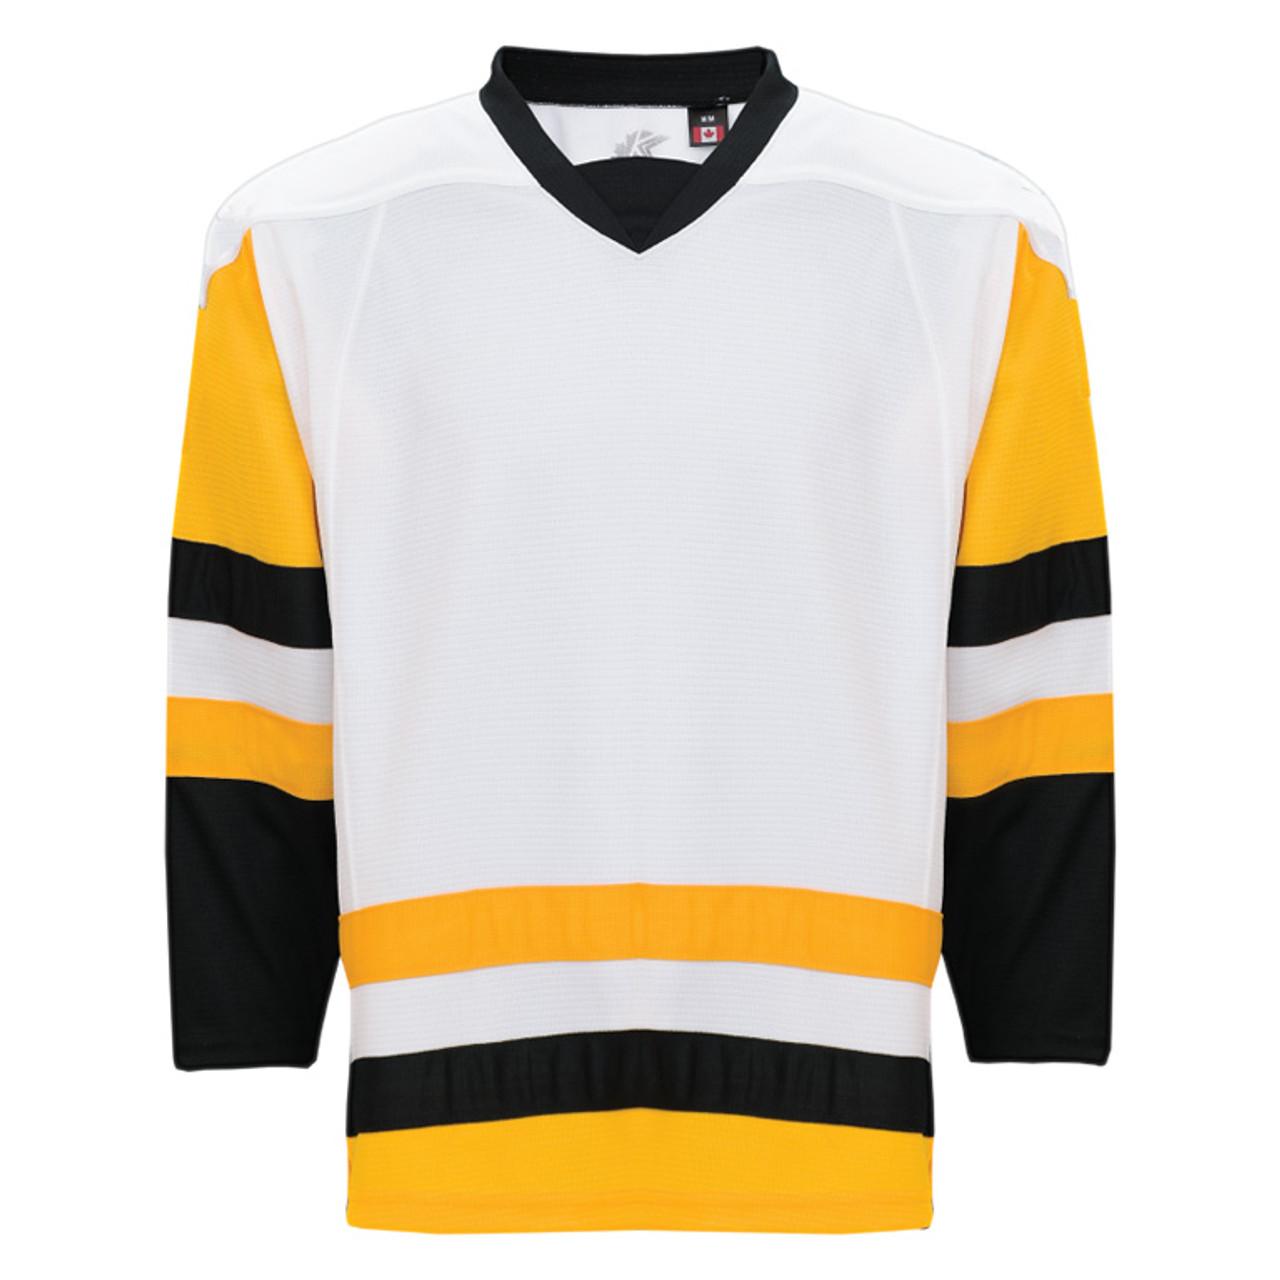 the best attitude 8fd62 aeba2 Kobe Pittsburgh White-K3G Youth Hockey Jersey-K3G87YH